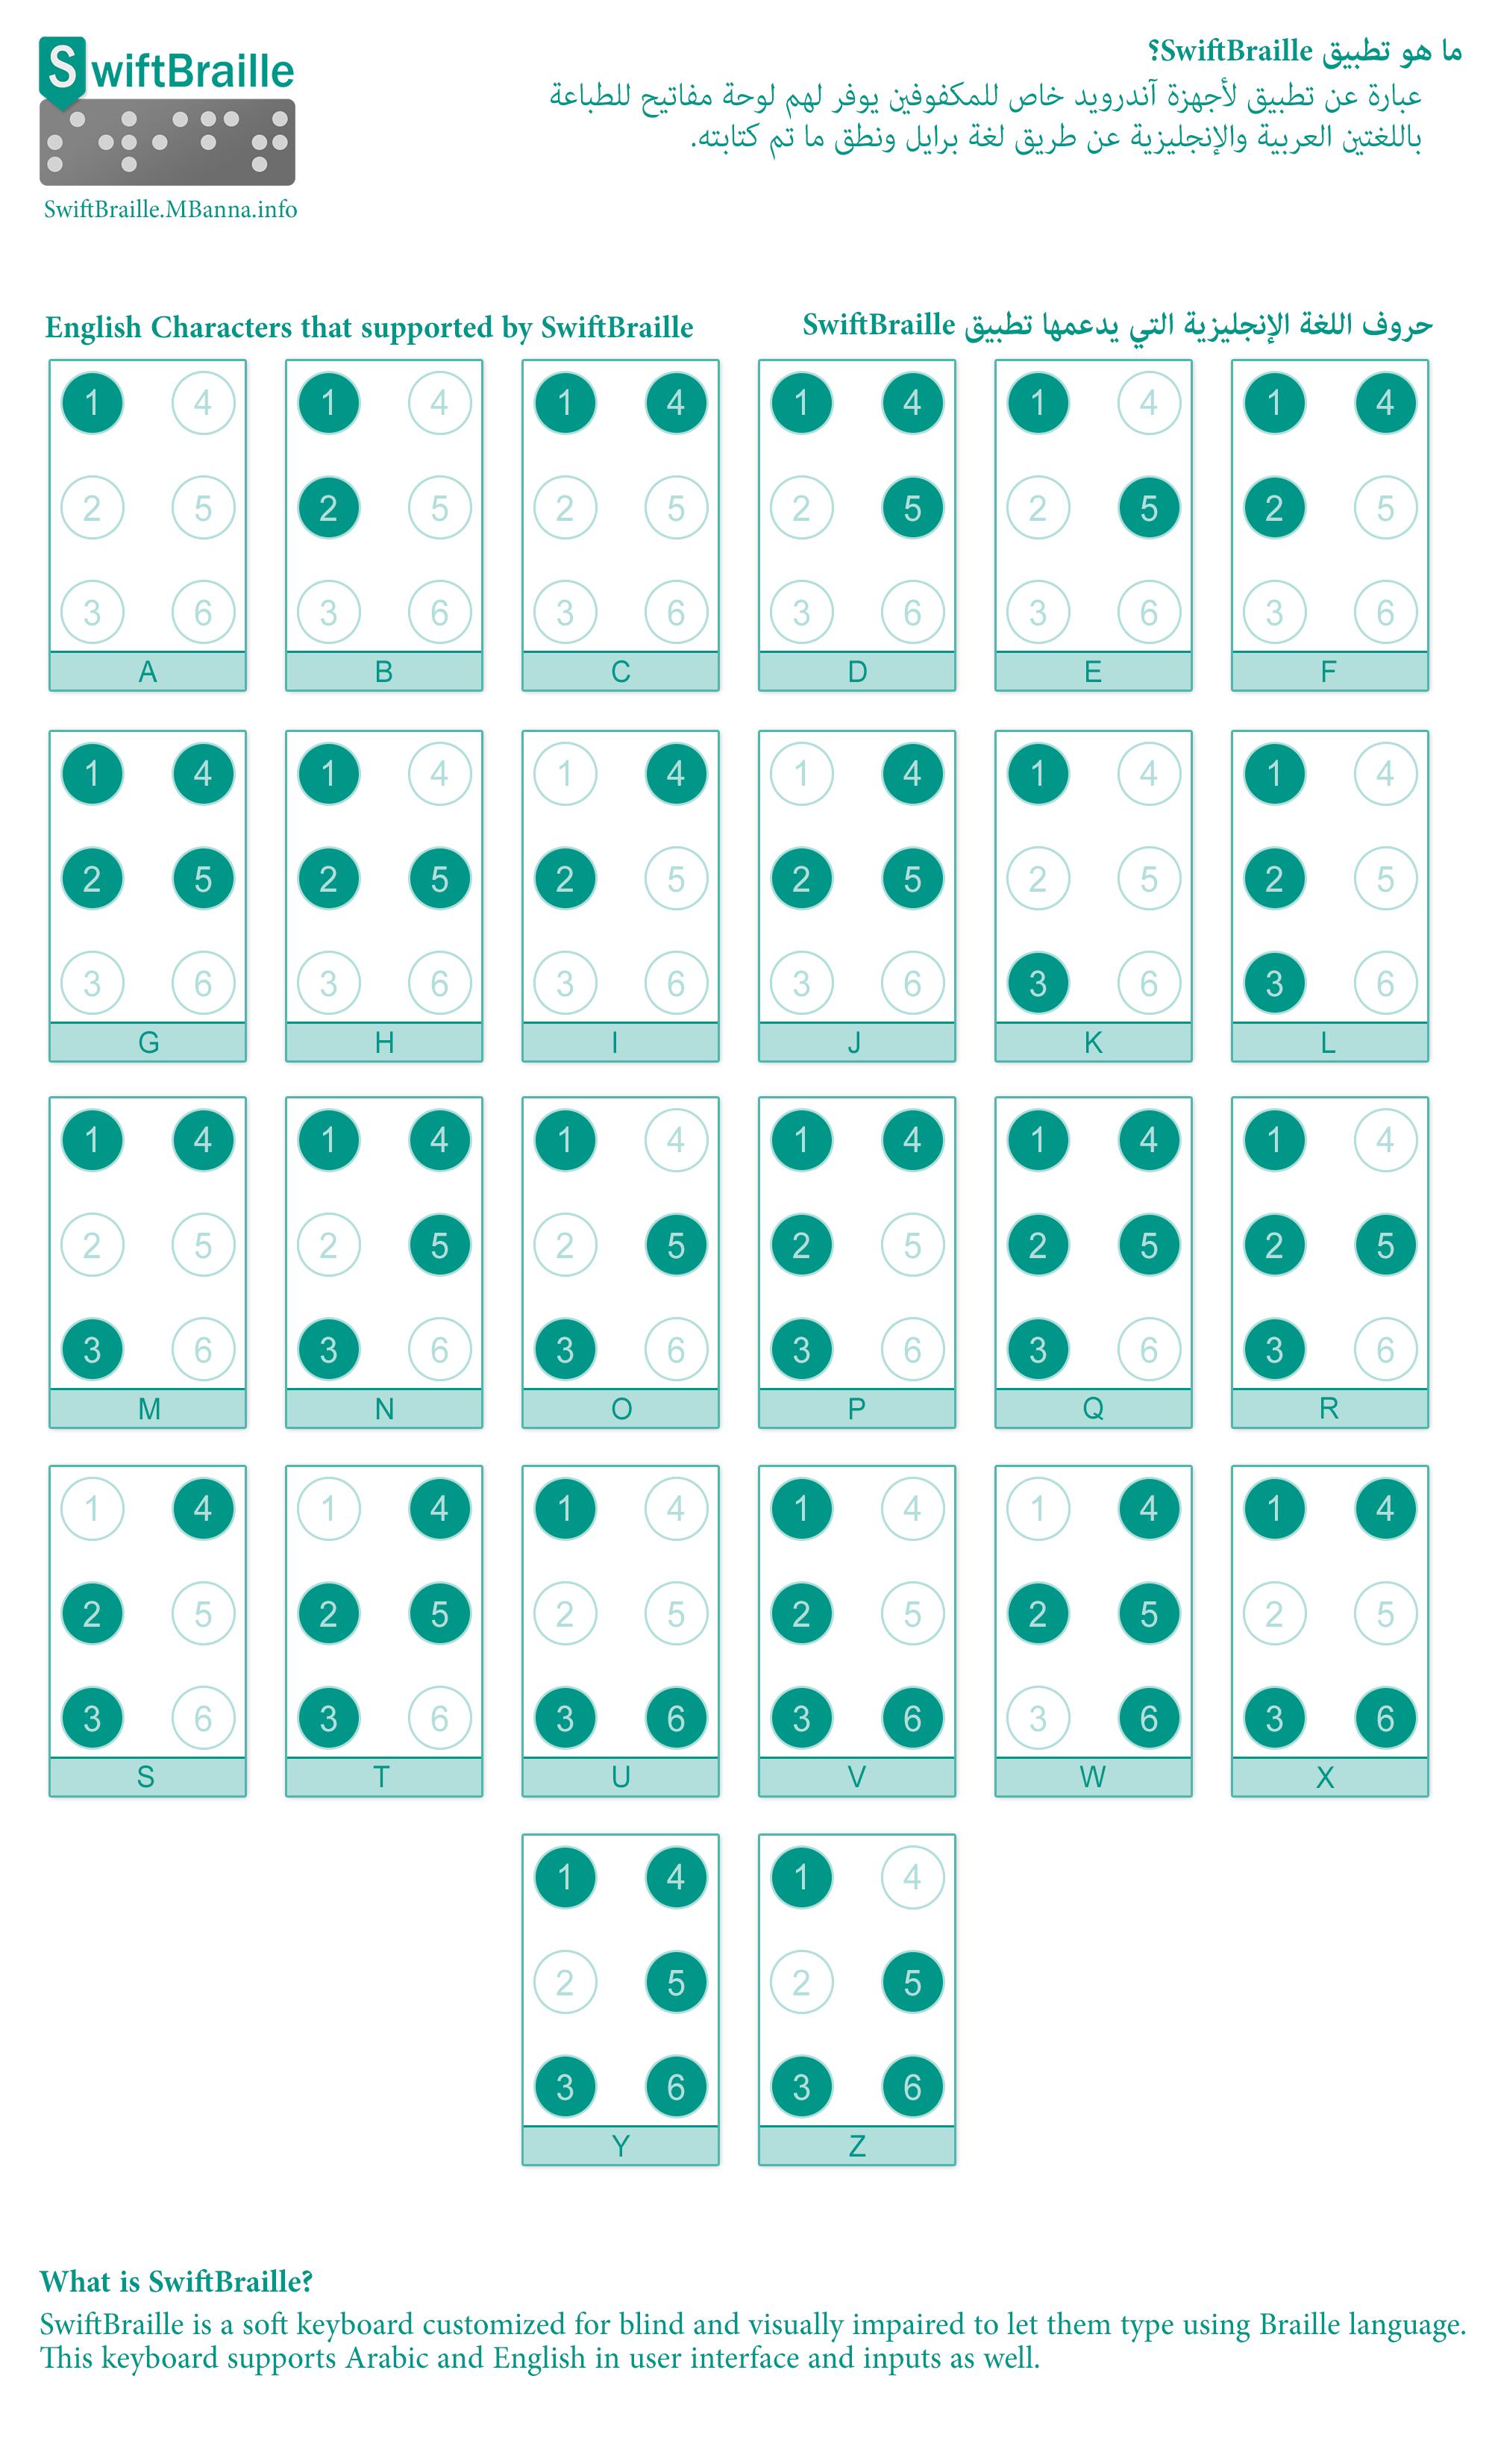 SwiftBraille - Android Braille Soft Keyboard | Mohammad AlBanna